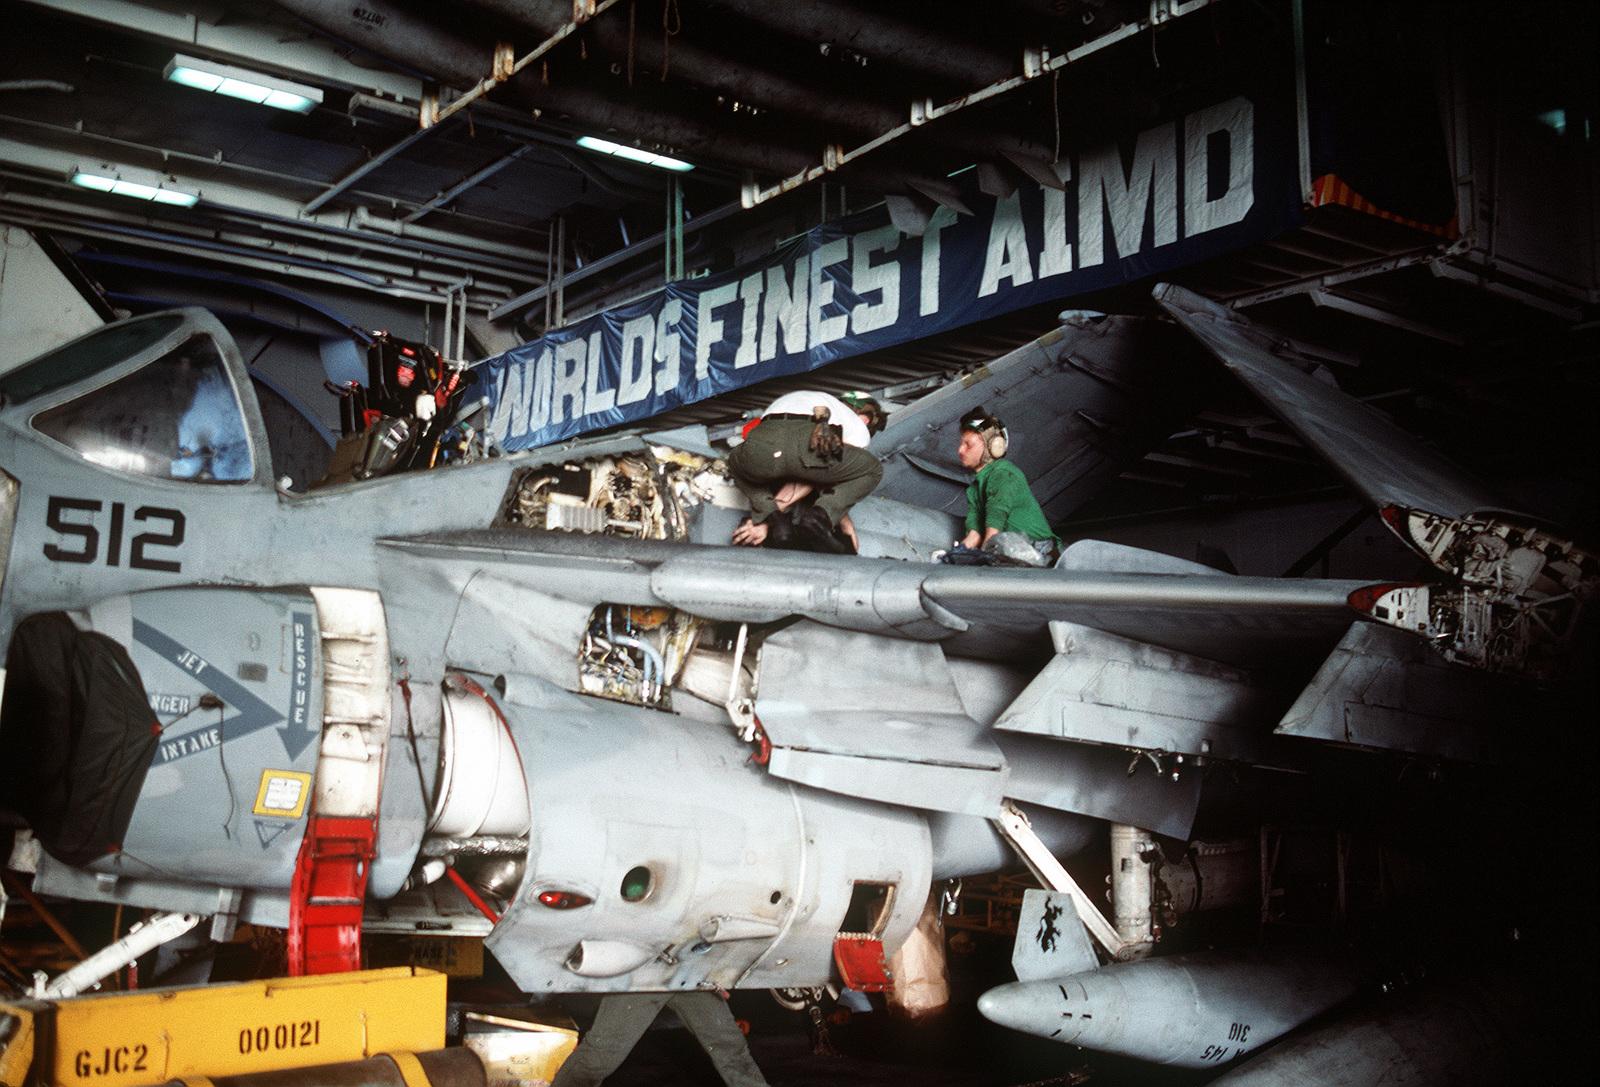 Maintenance crewmen work on an Attack Squadron 145 (VA-145) A-6E Intruder aircraft on the hangar deck of the aircraft carrier USS RANGER (CV-61). The RANGER is on station in the Persian Gulf region following Operation Desert Storm